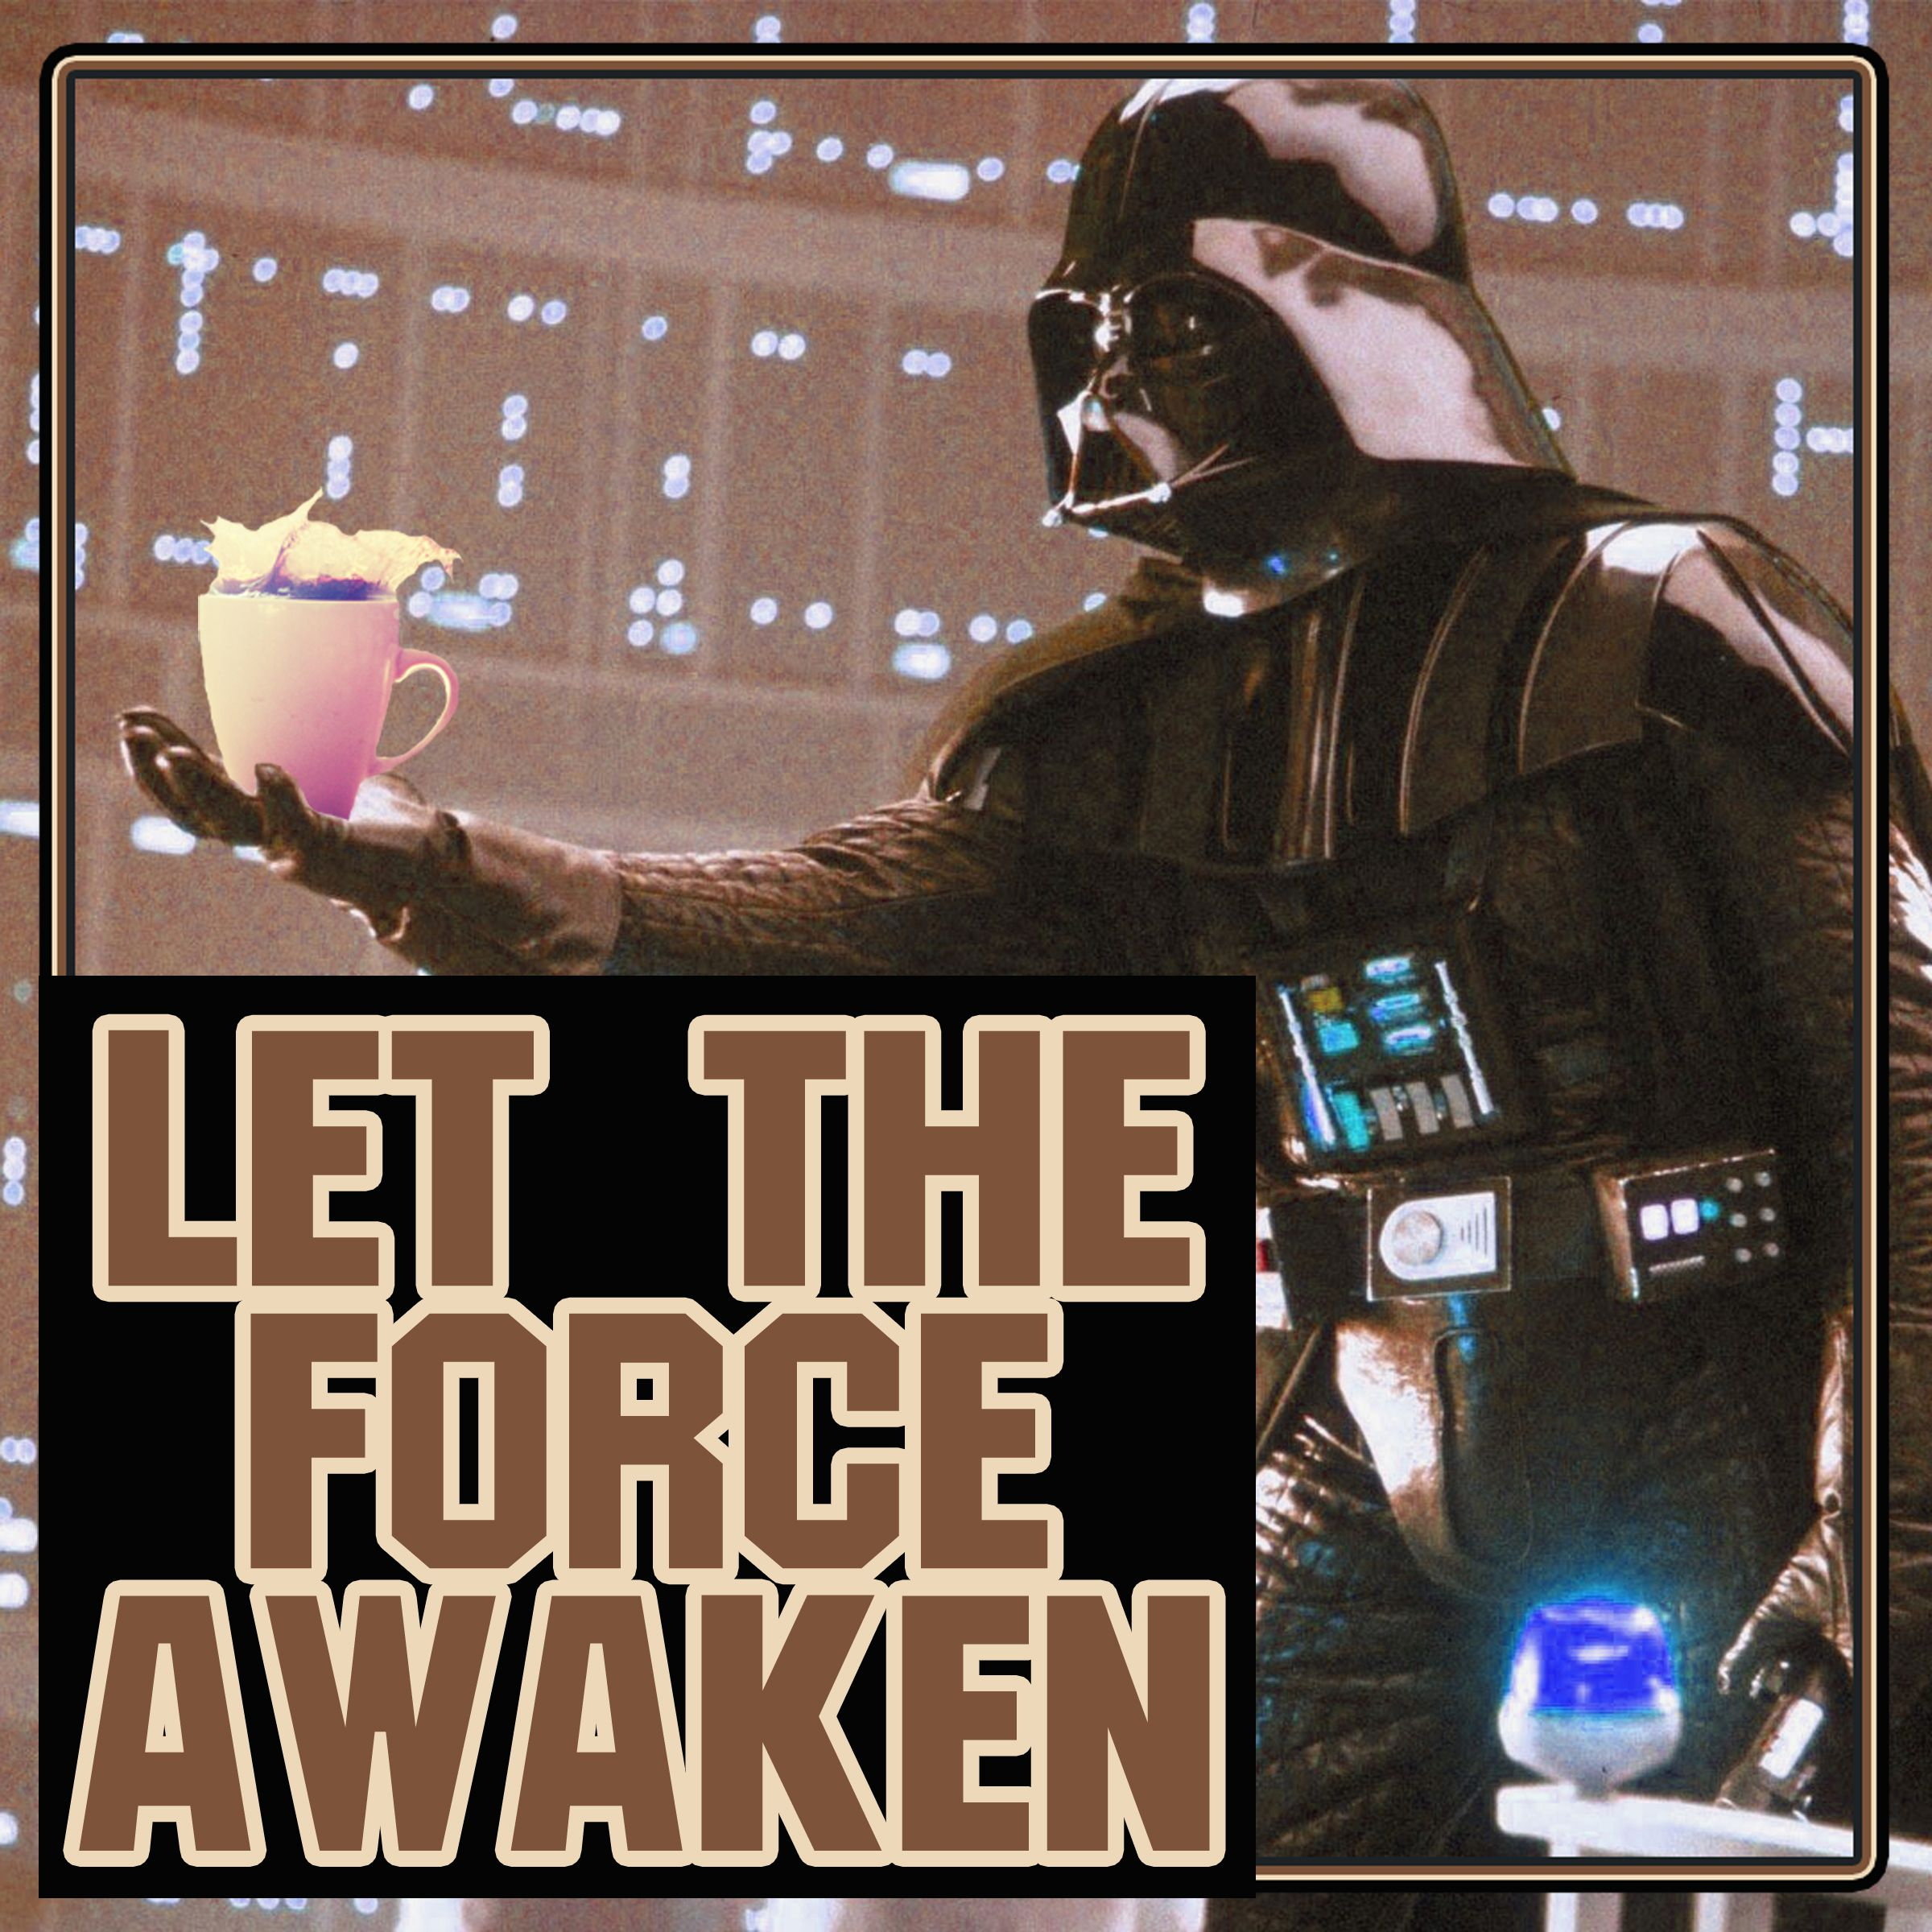 Let The Force Awaken Starwarsmemes Starwars Theforceawakens Darthvader Vader Coffee Morningperson Coffeemem Star Wars Humor Star Wars Memes Darth Vadar